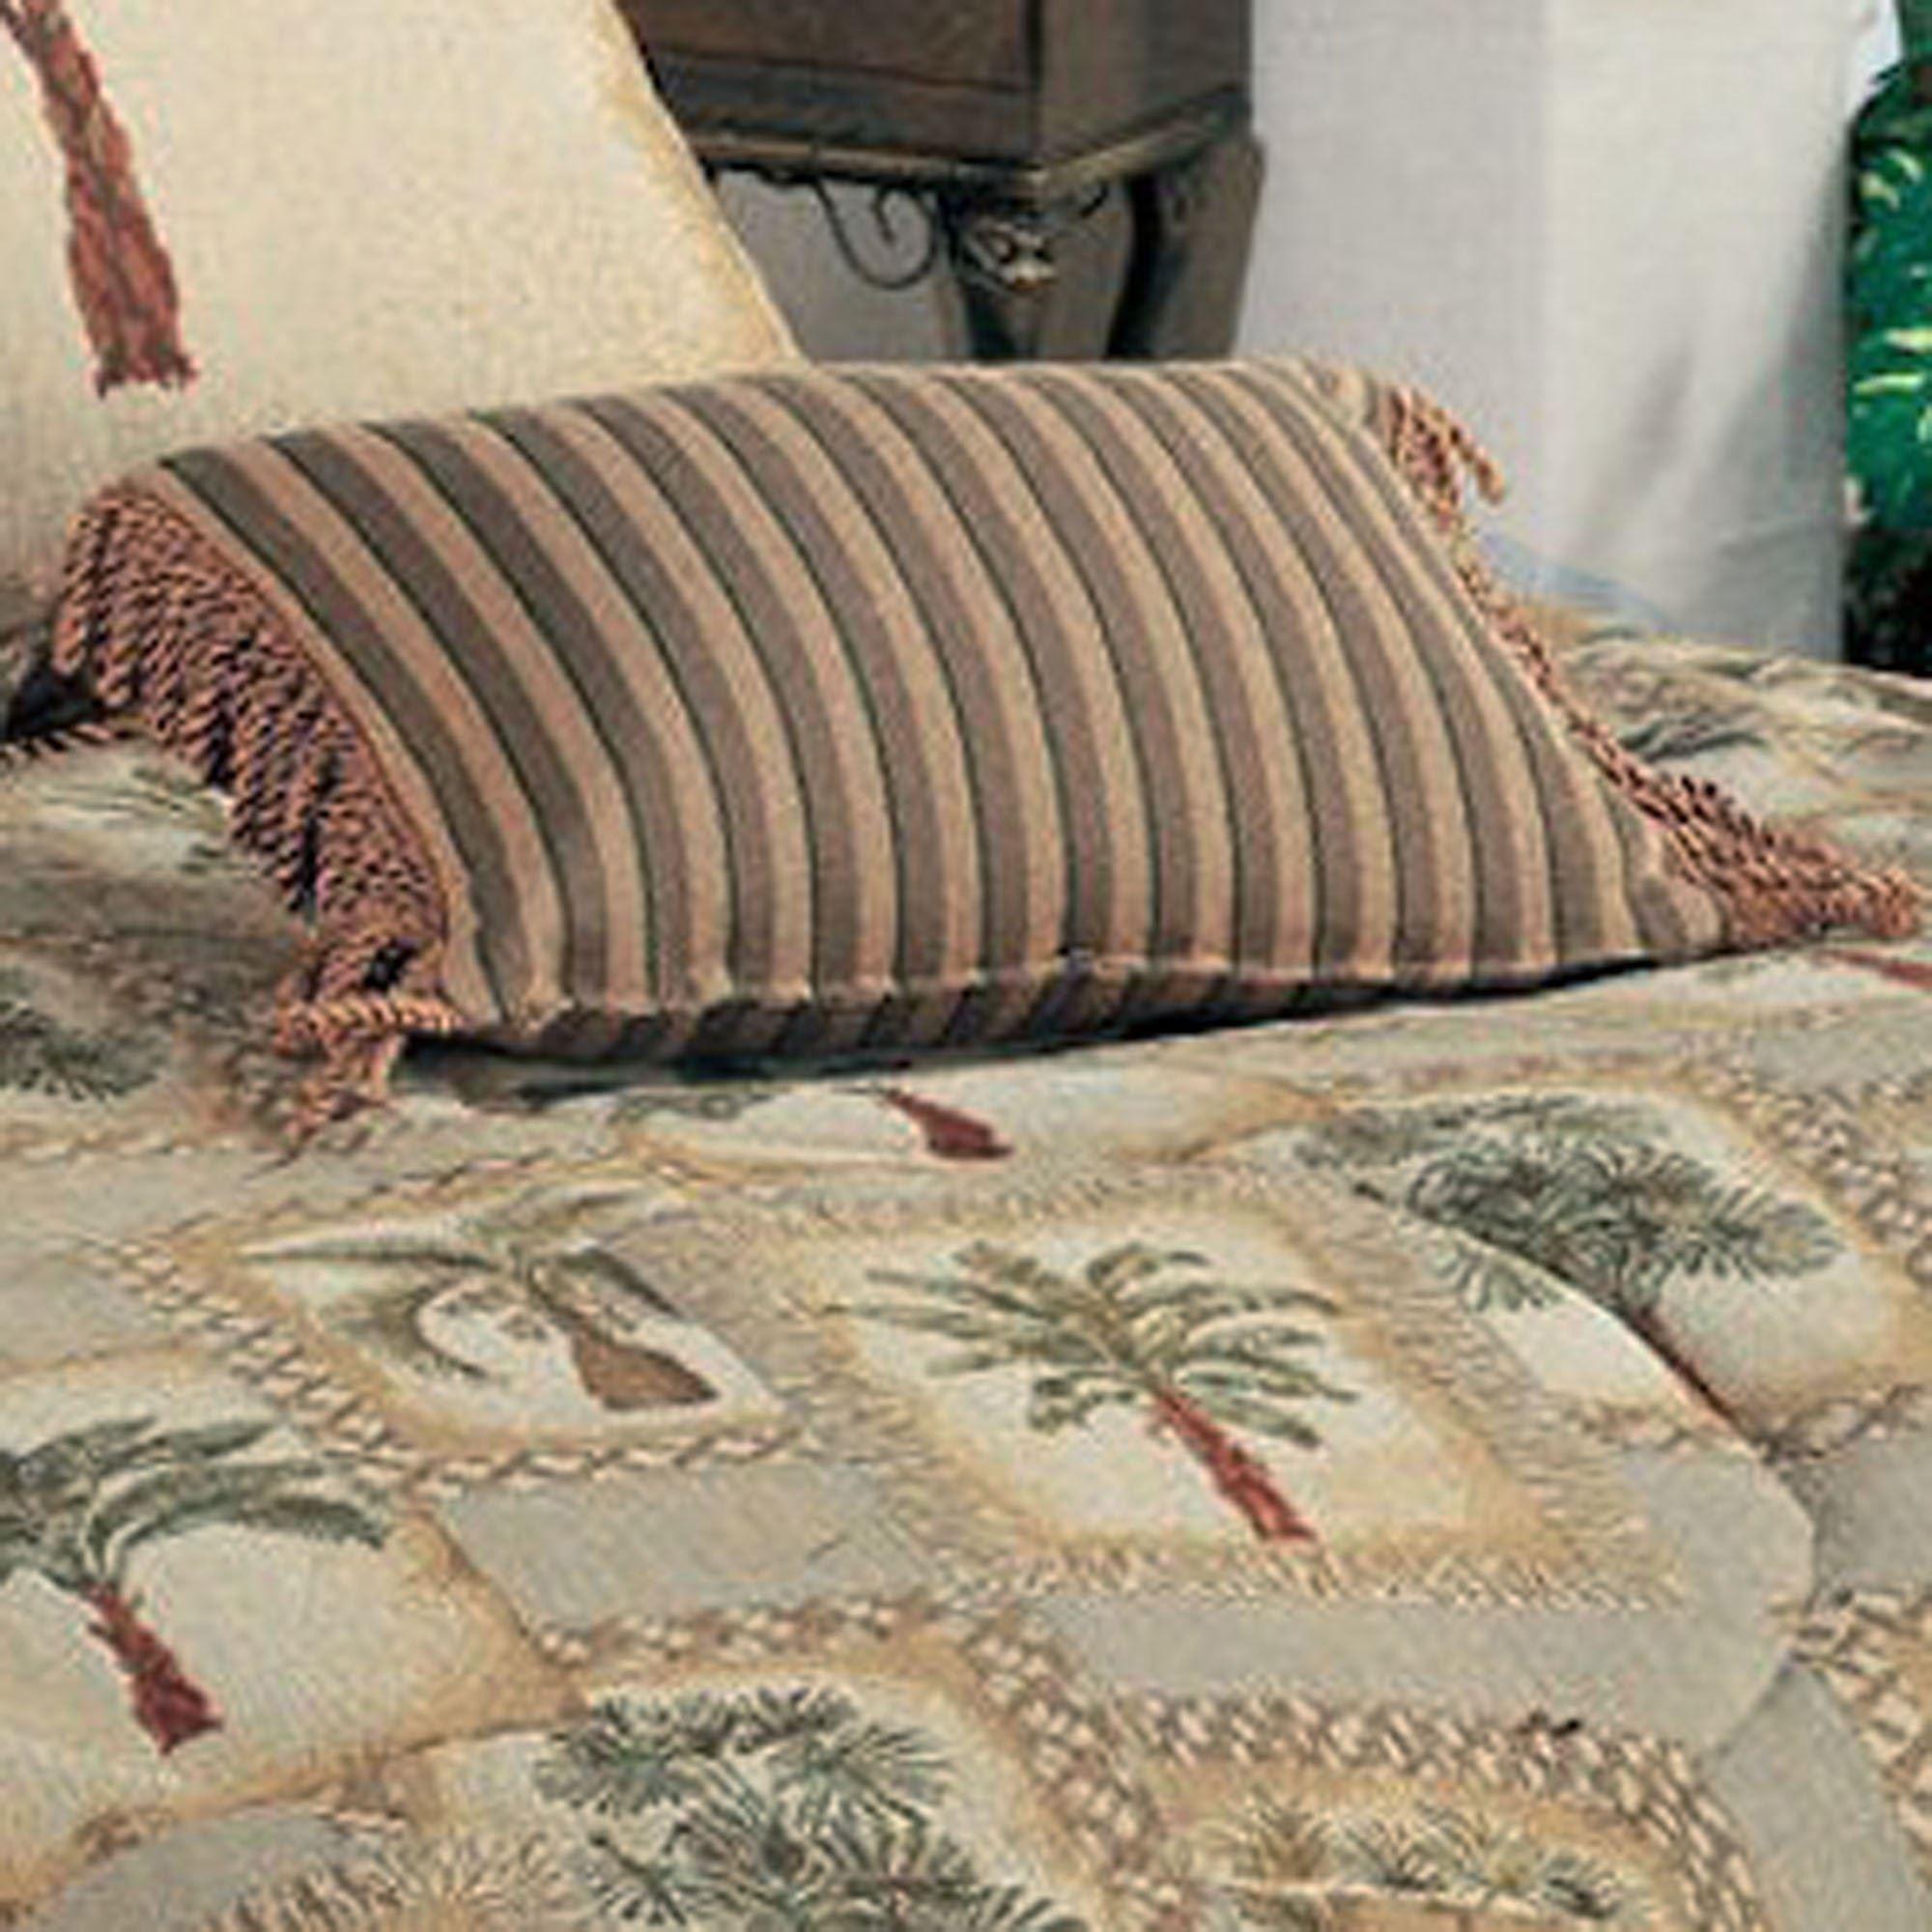 Favorite Palm Grove Tropical Palm Tree Comforter Bedding ZD47